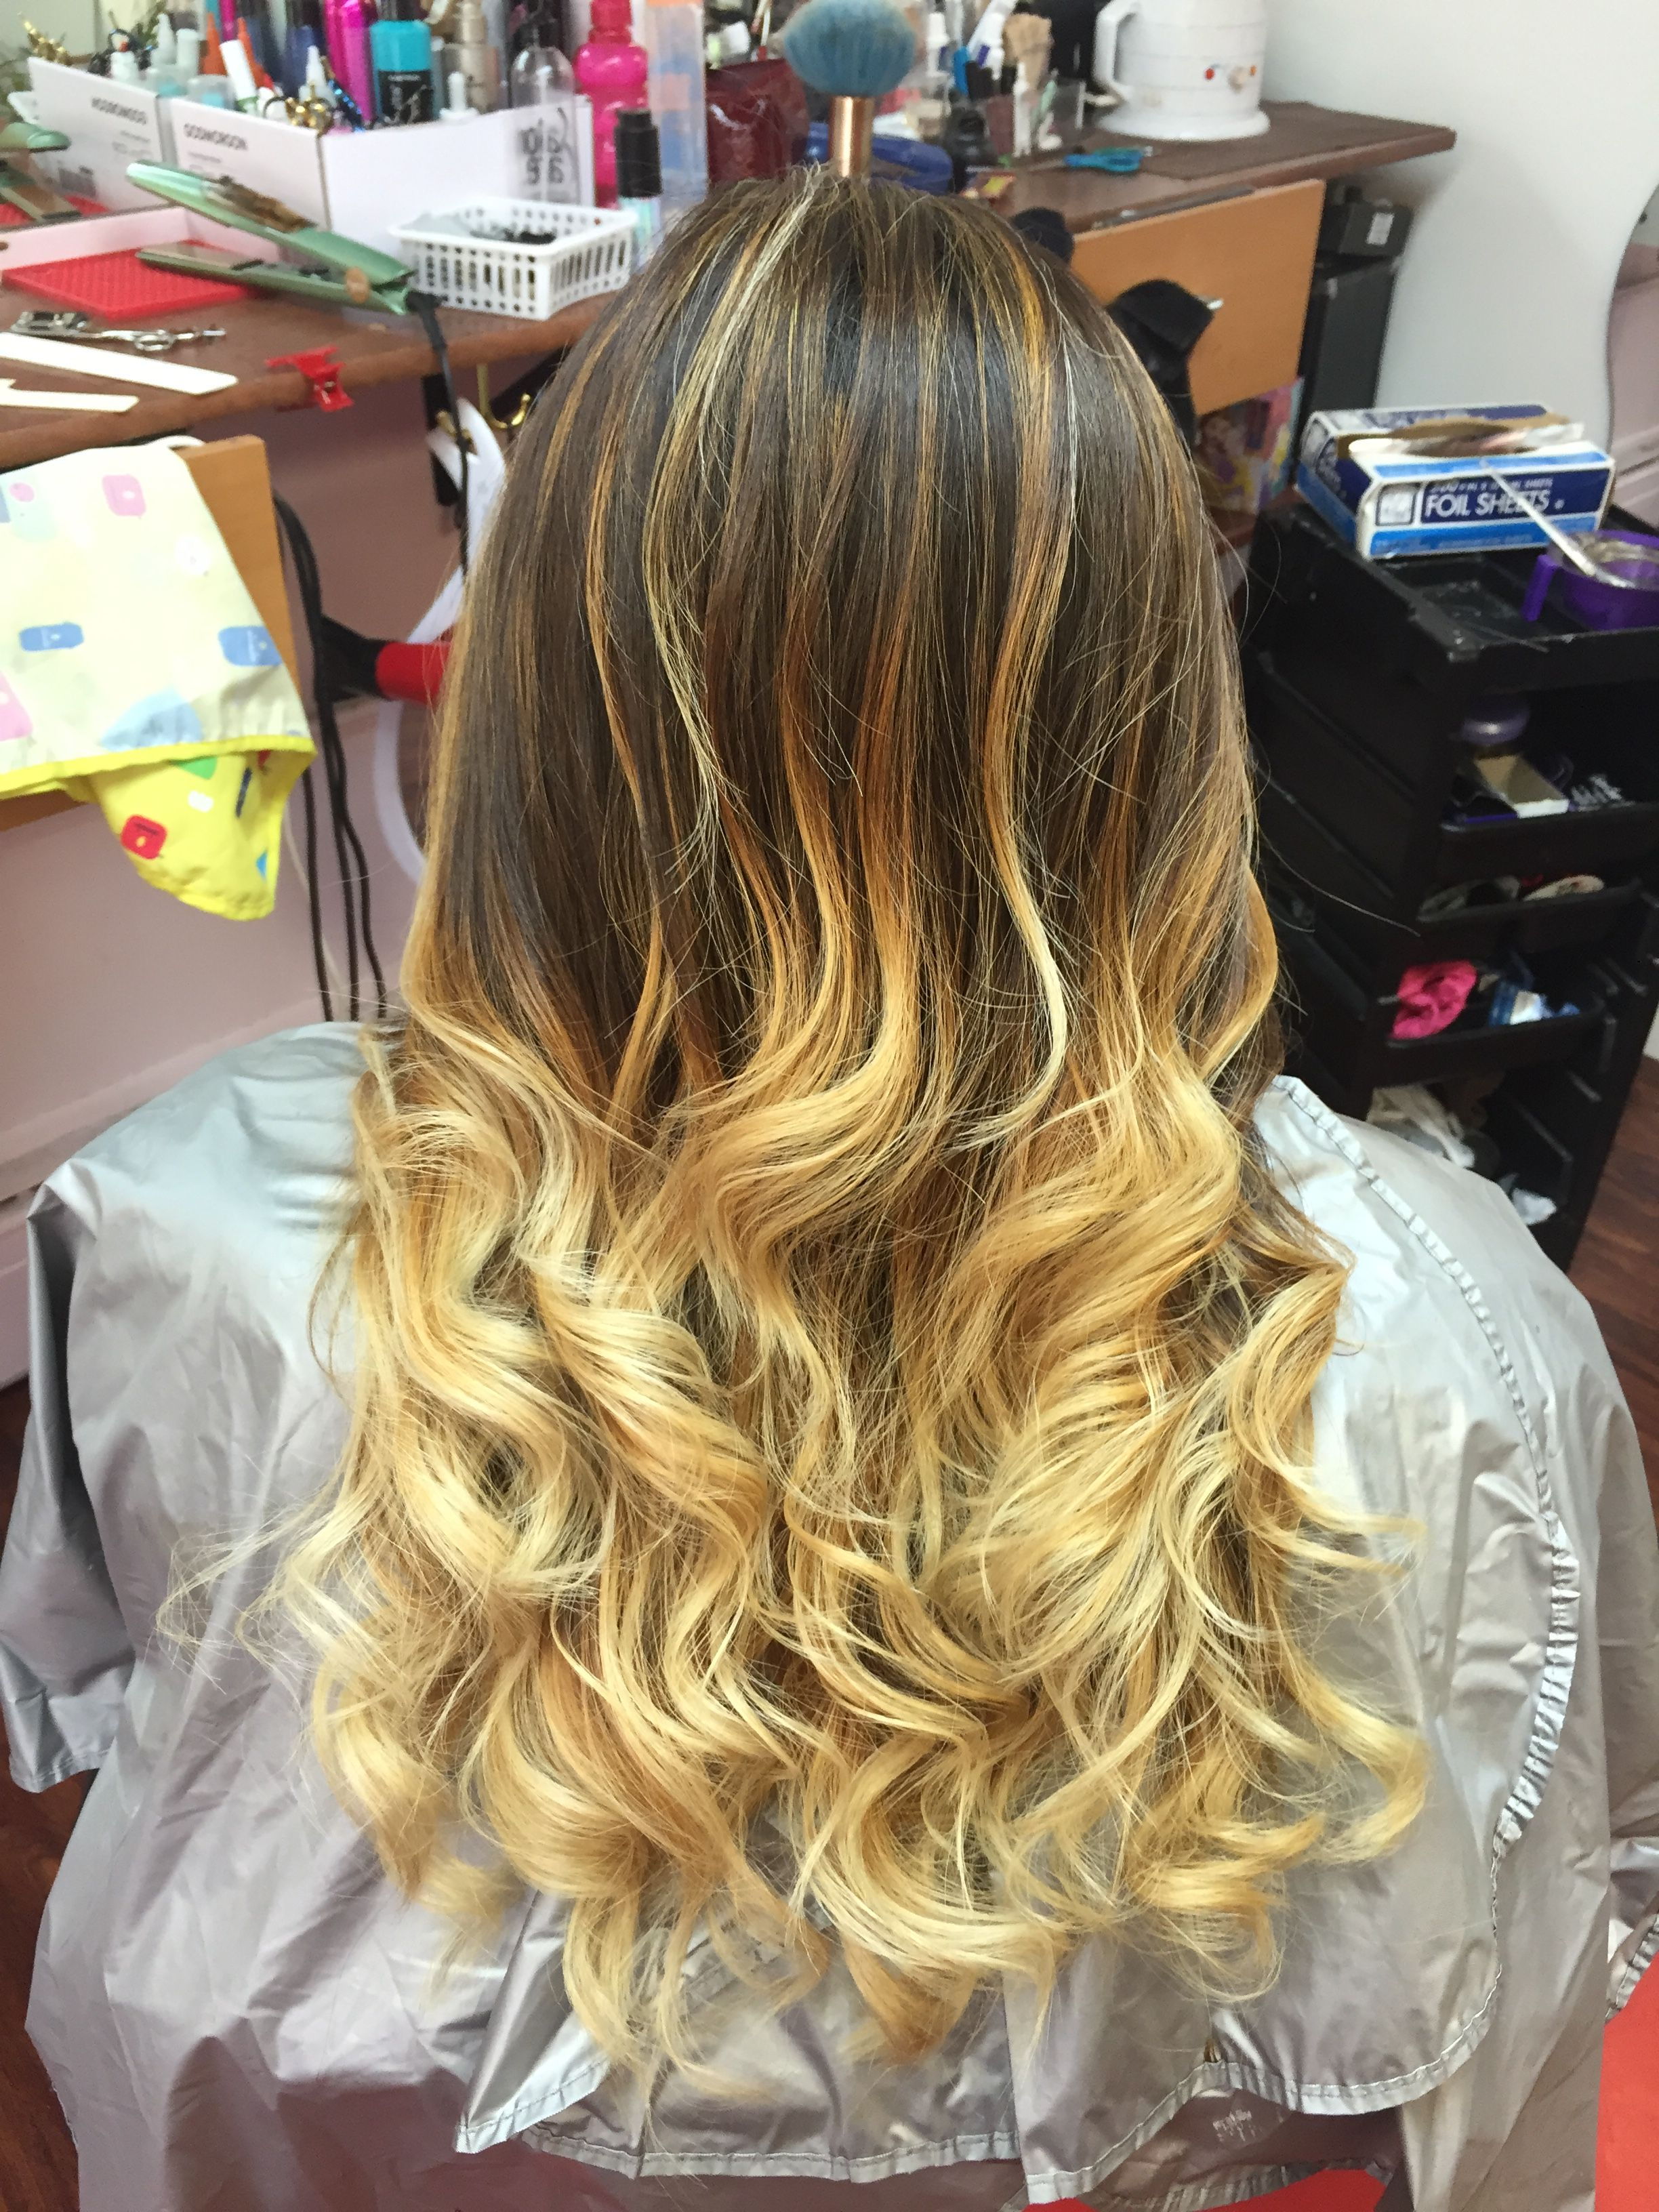 Pin by Alba Macias on Mi trabajo Hair styles, Beauty, Hair